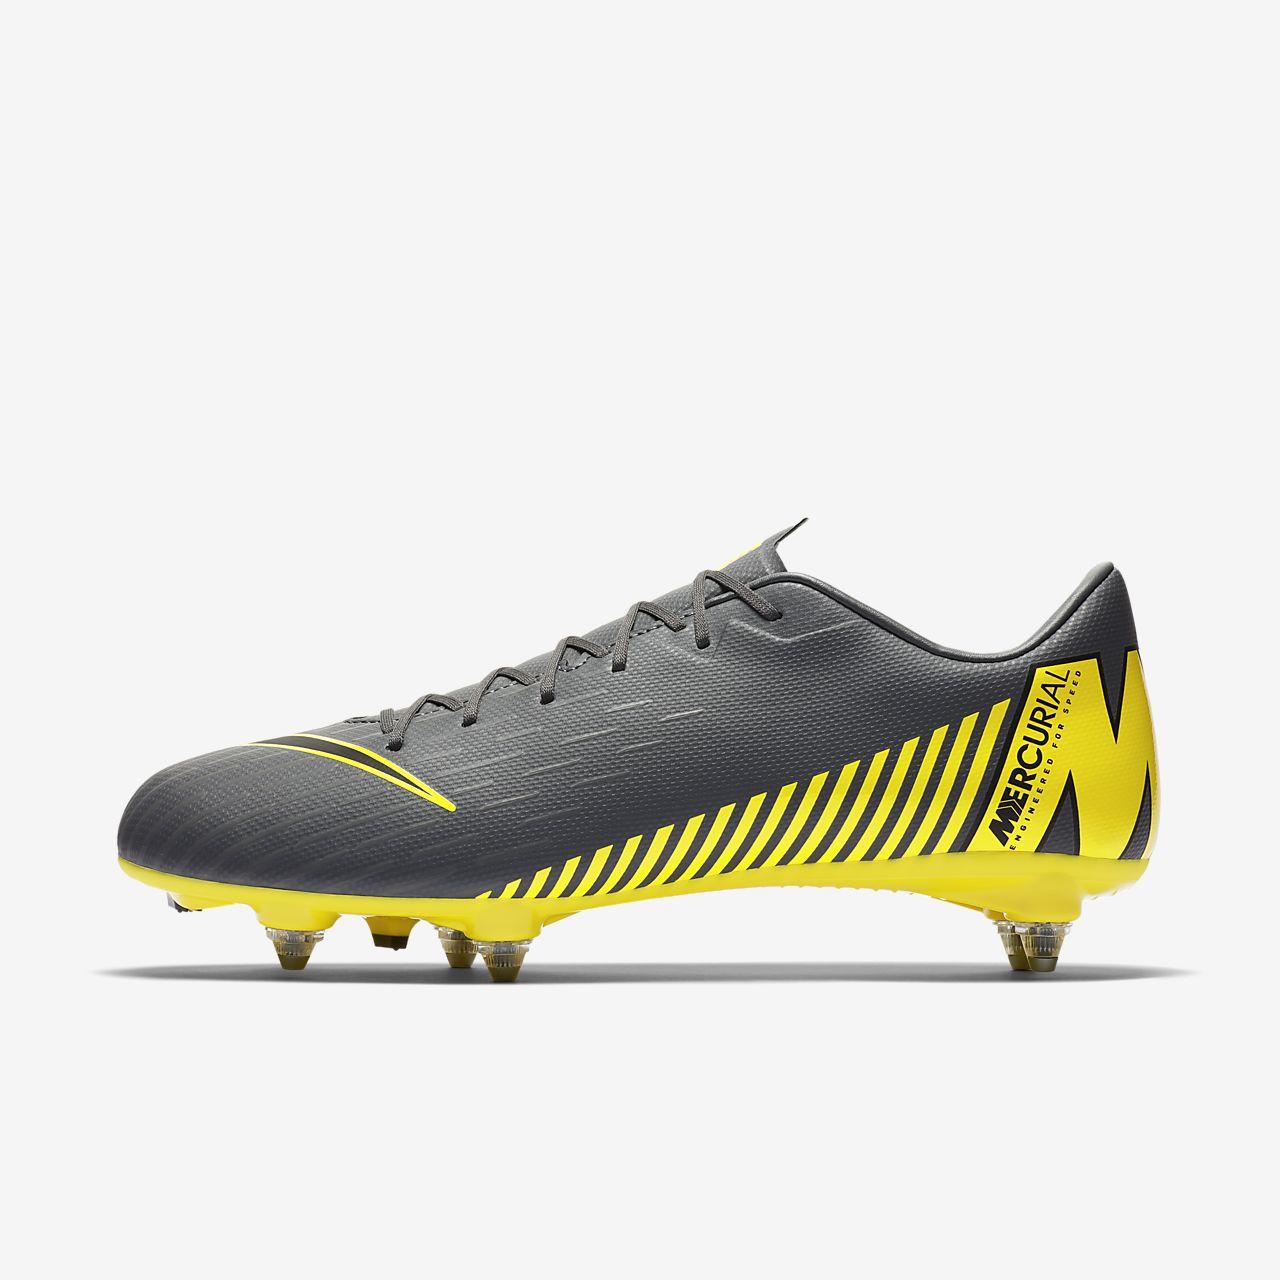 best website 6b762 70dec ... Scarpa da calcio per terreni morbidi Nike Mercurial Vapor XII Academy SG -PRO